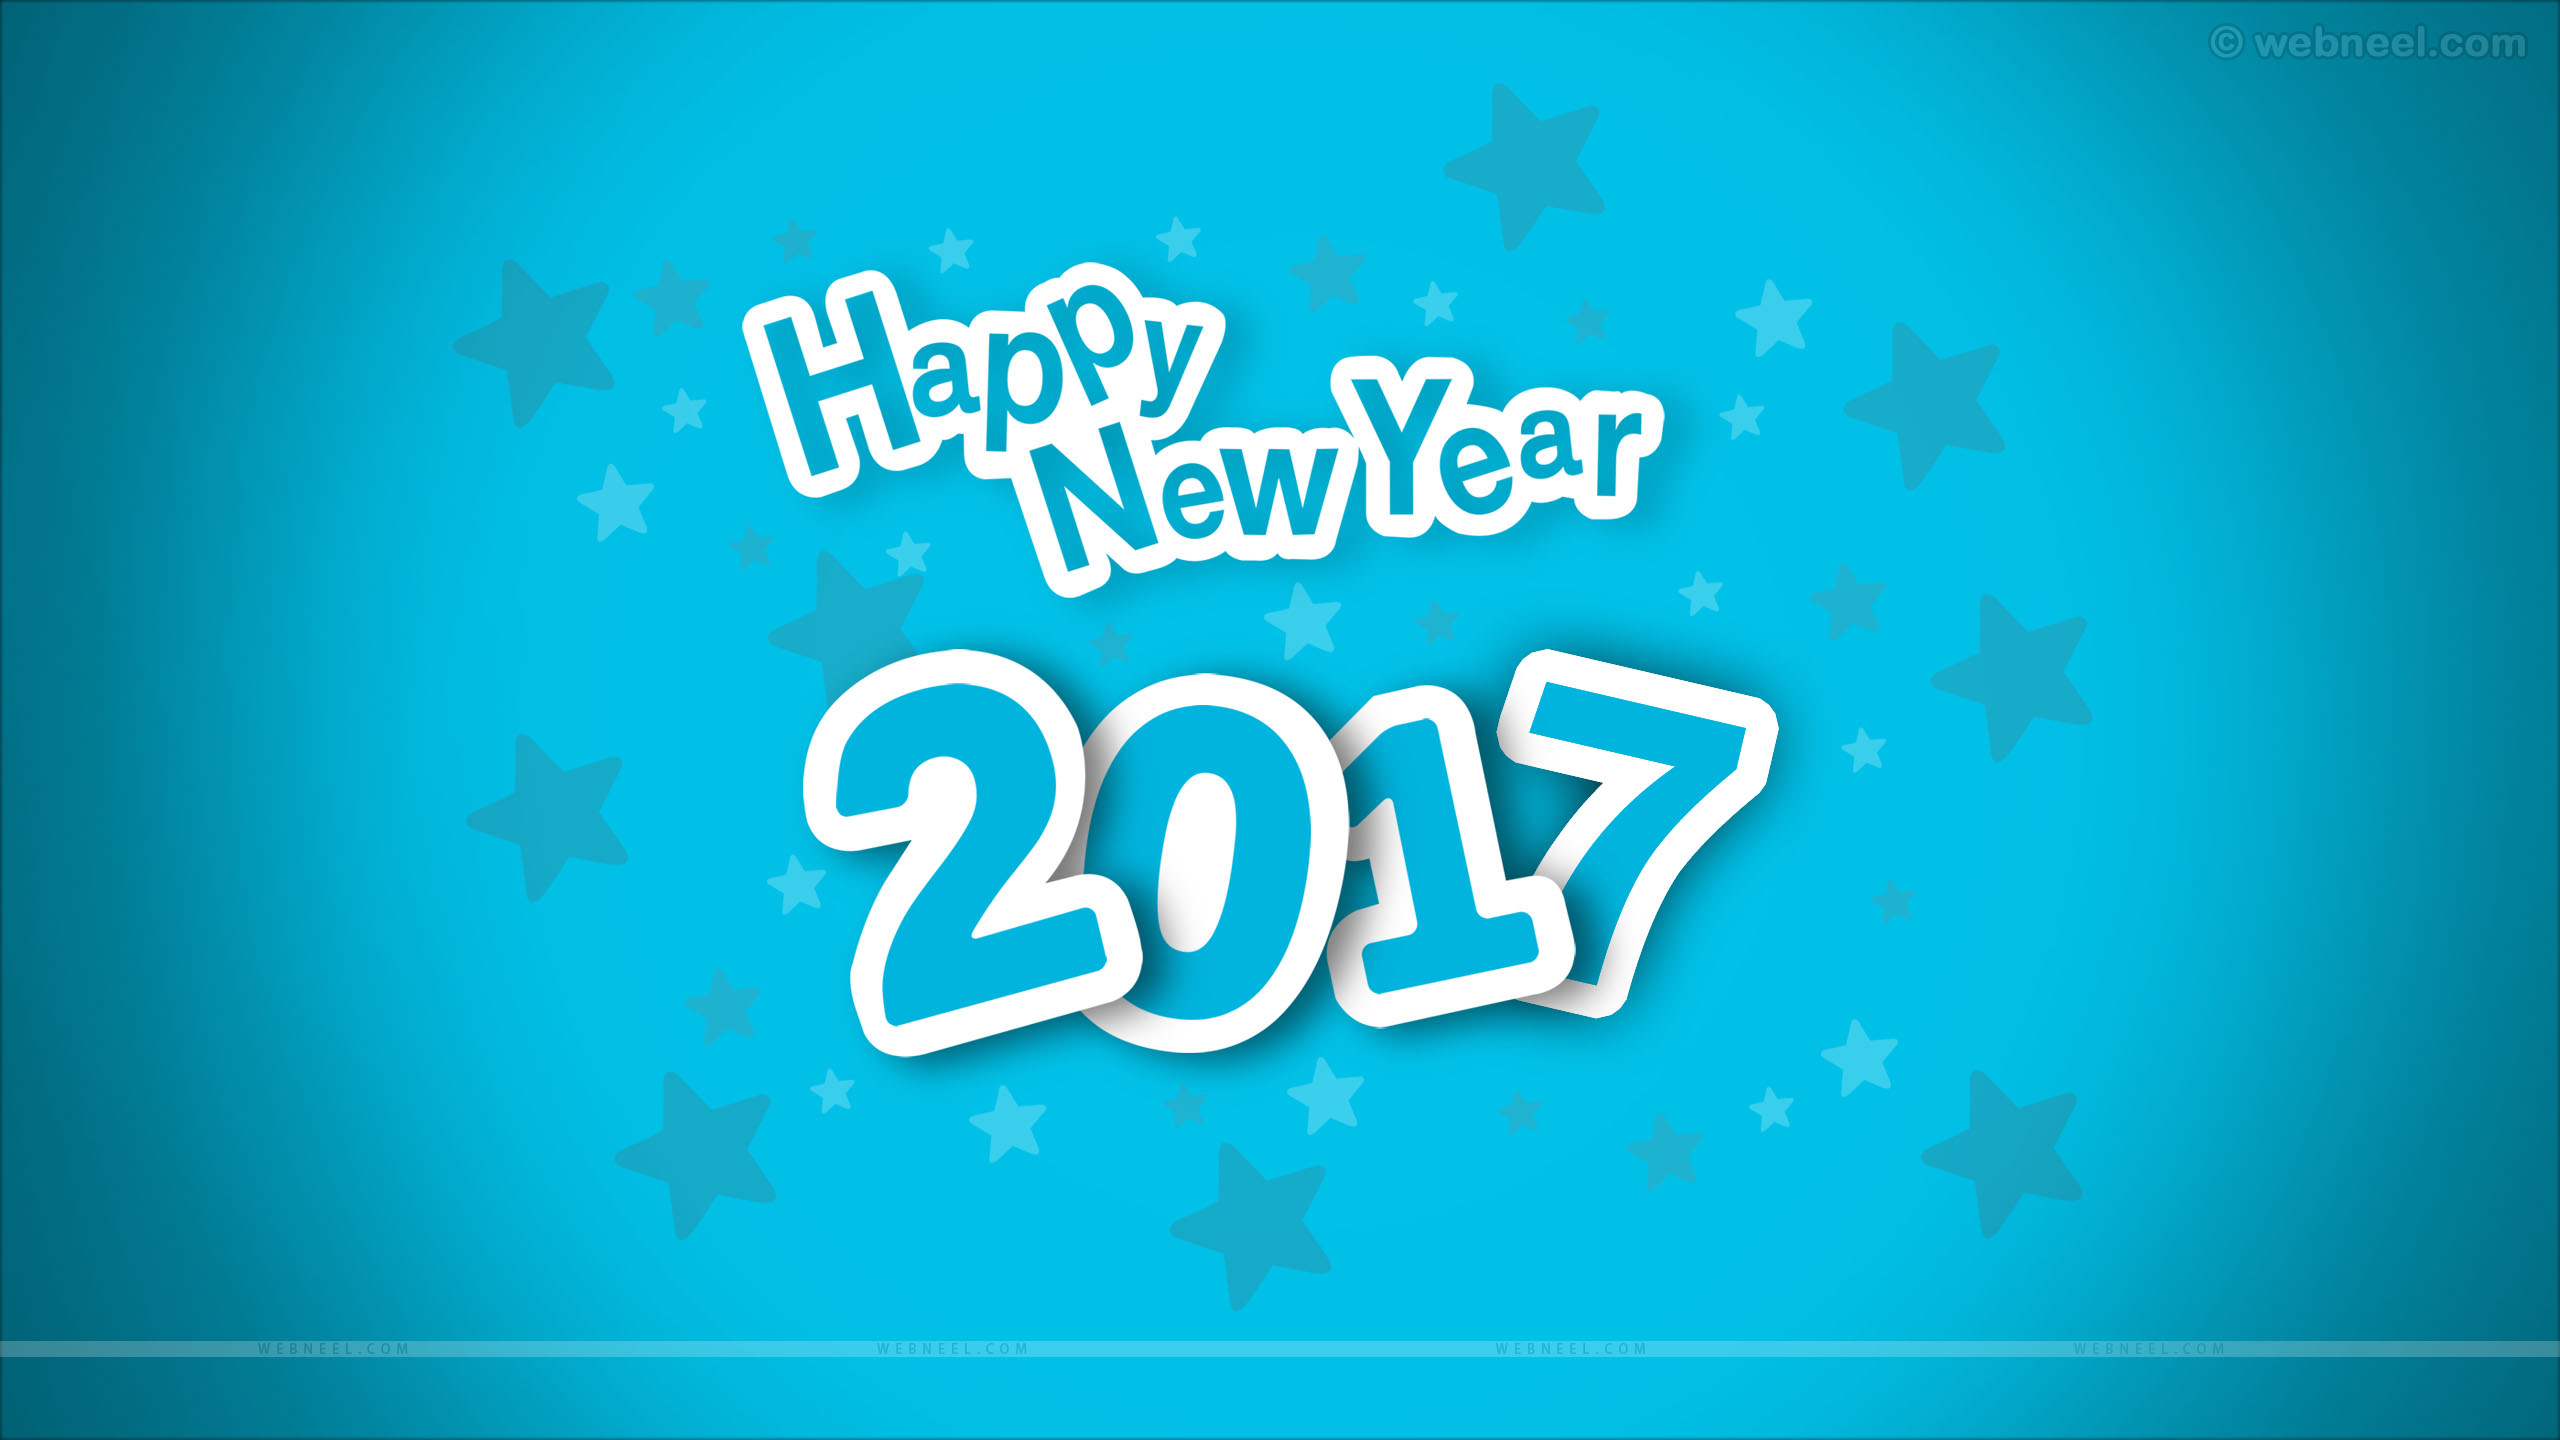 new year wallpaper blue